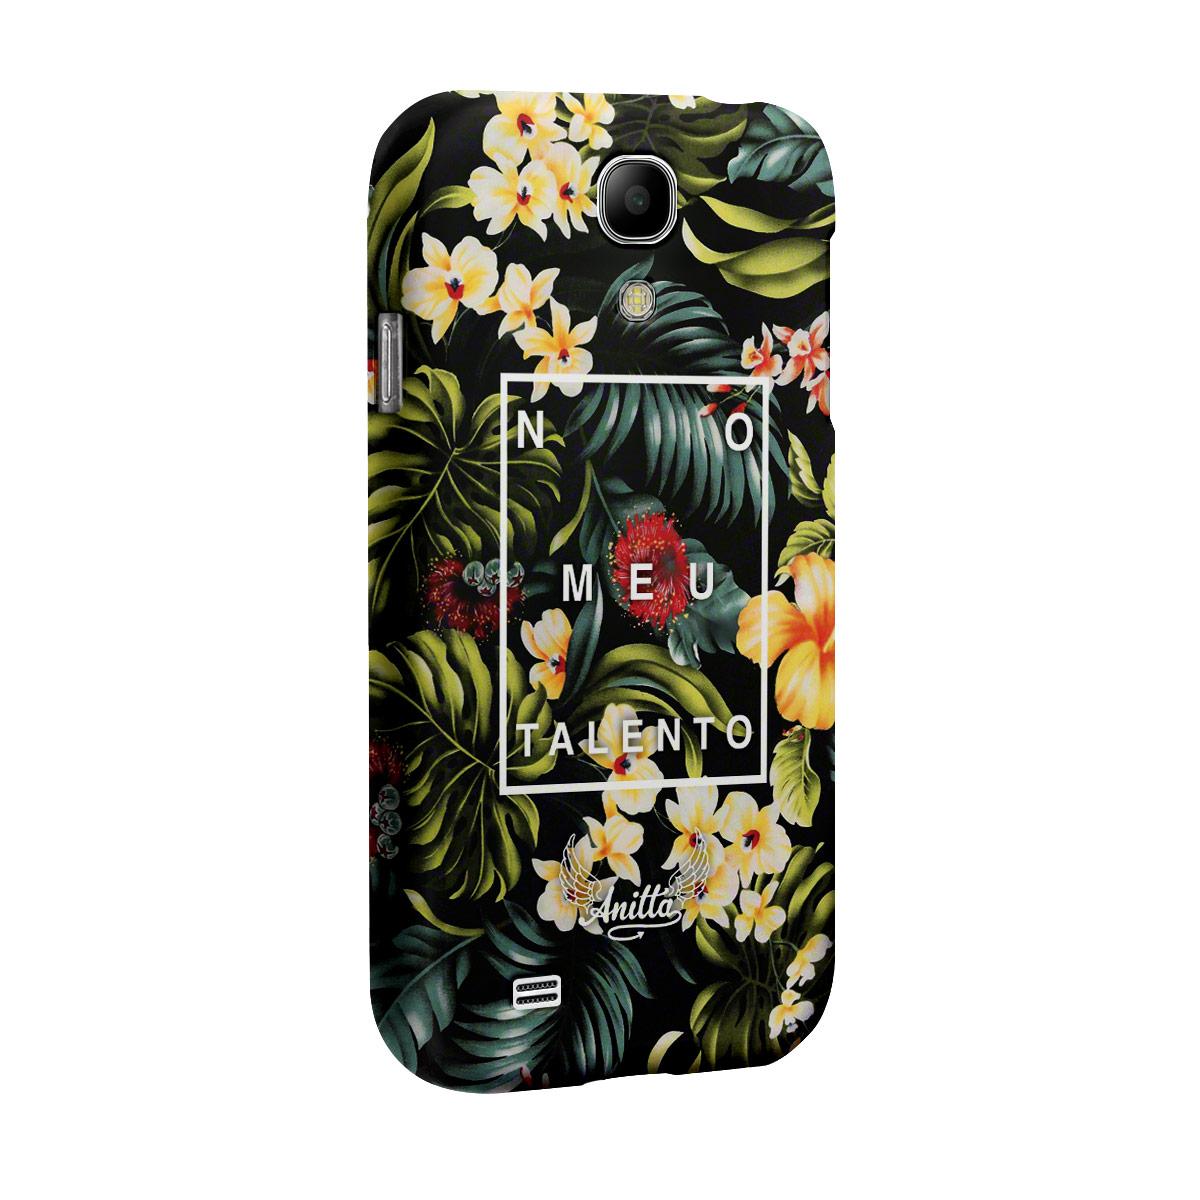 Capa para Samsung Galaxy S4 Anitta No Meu Talento Flowers